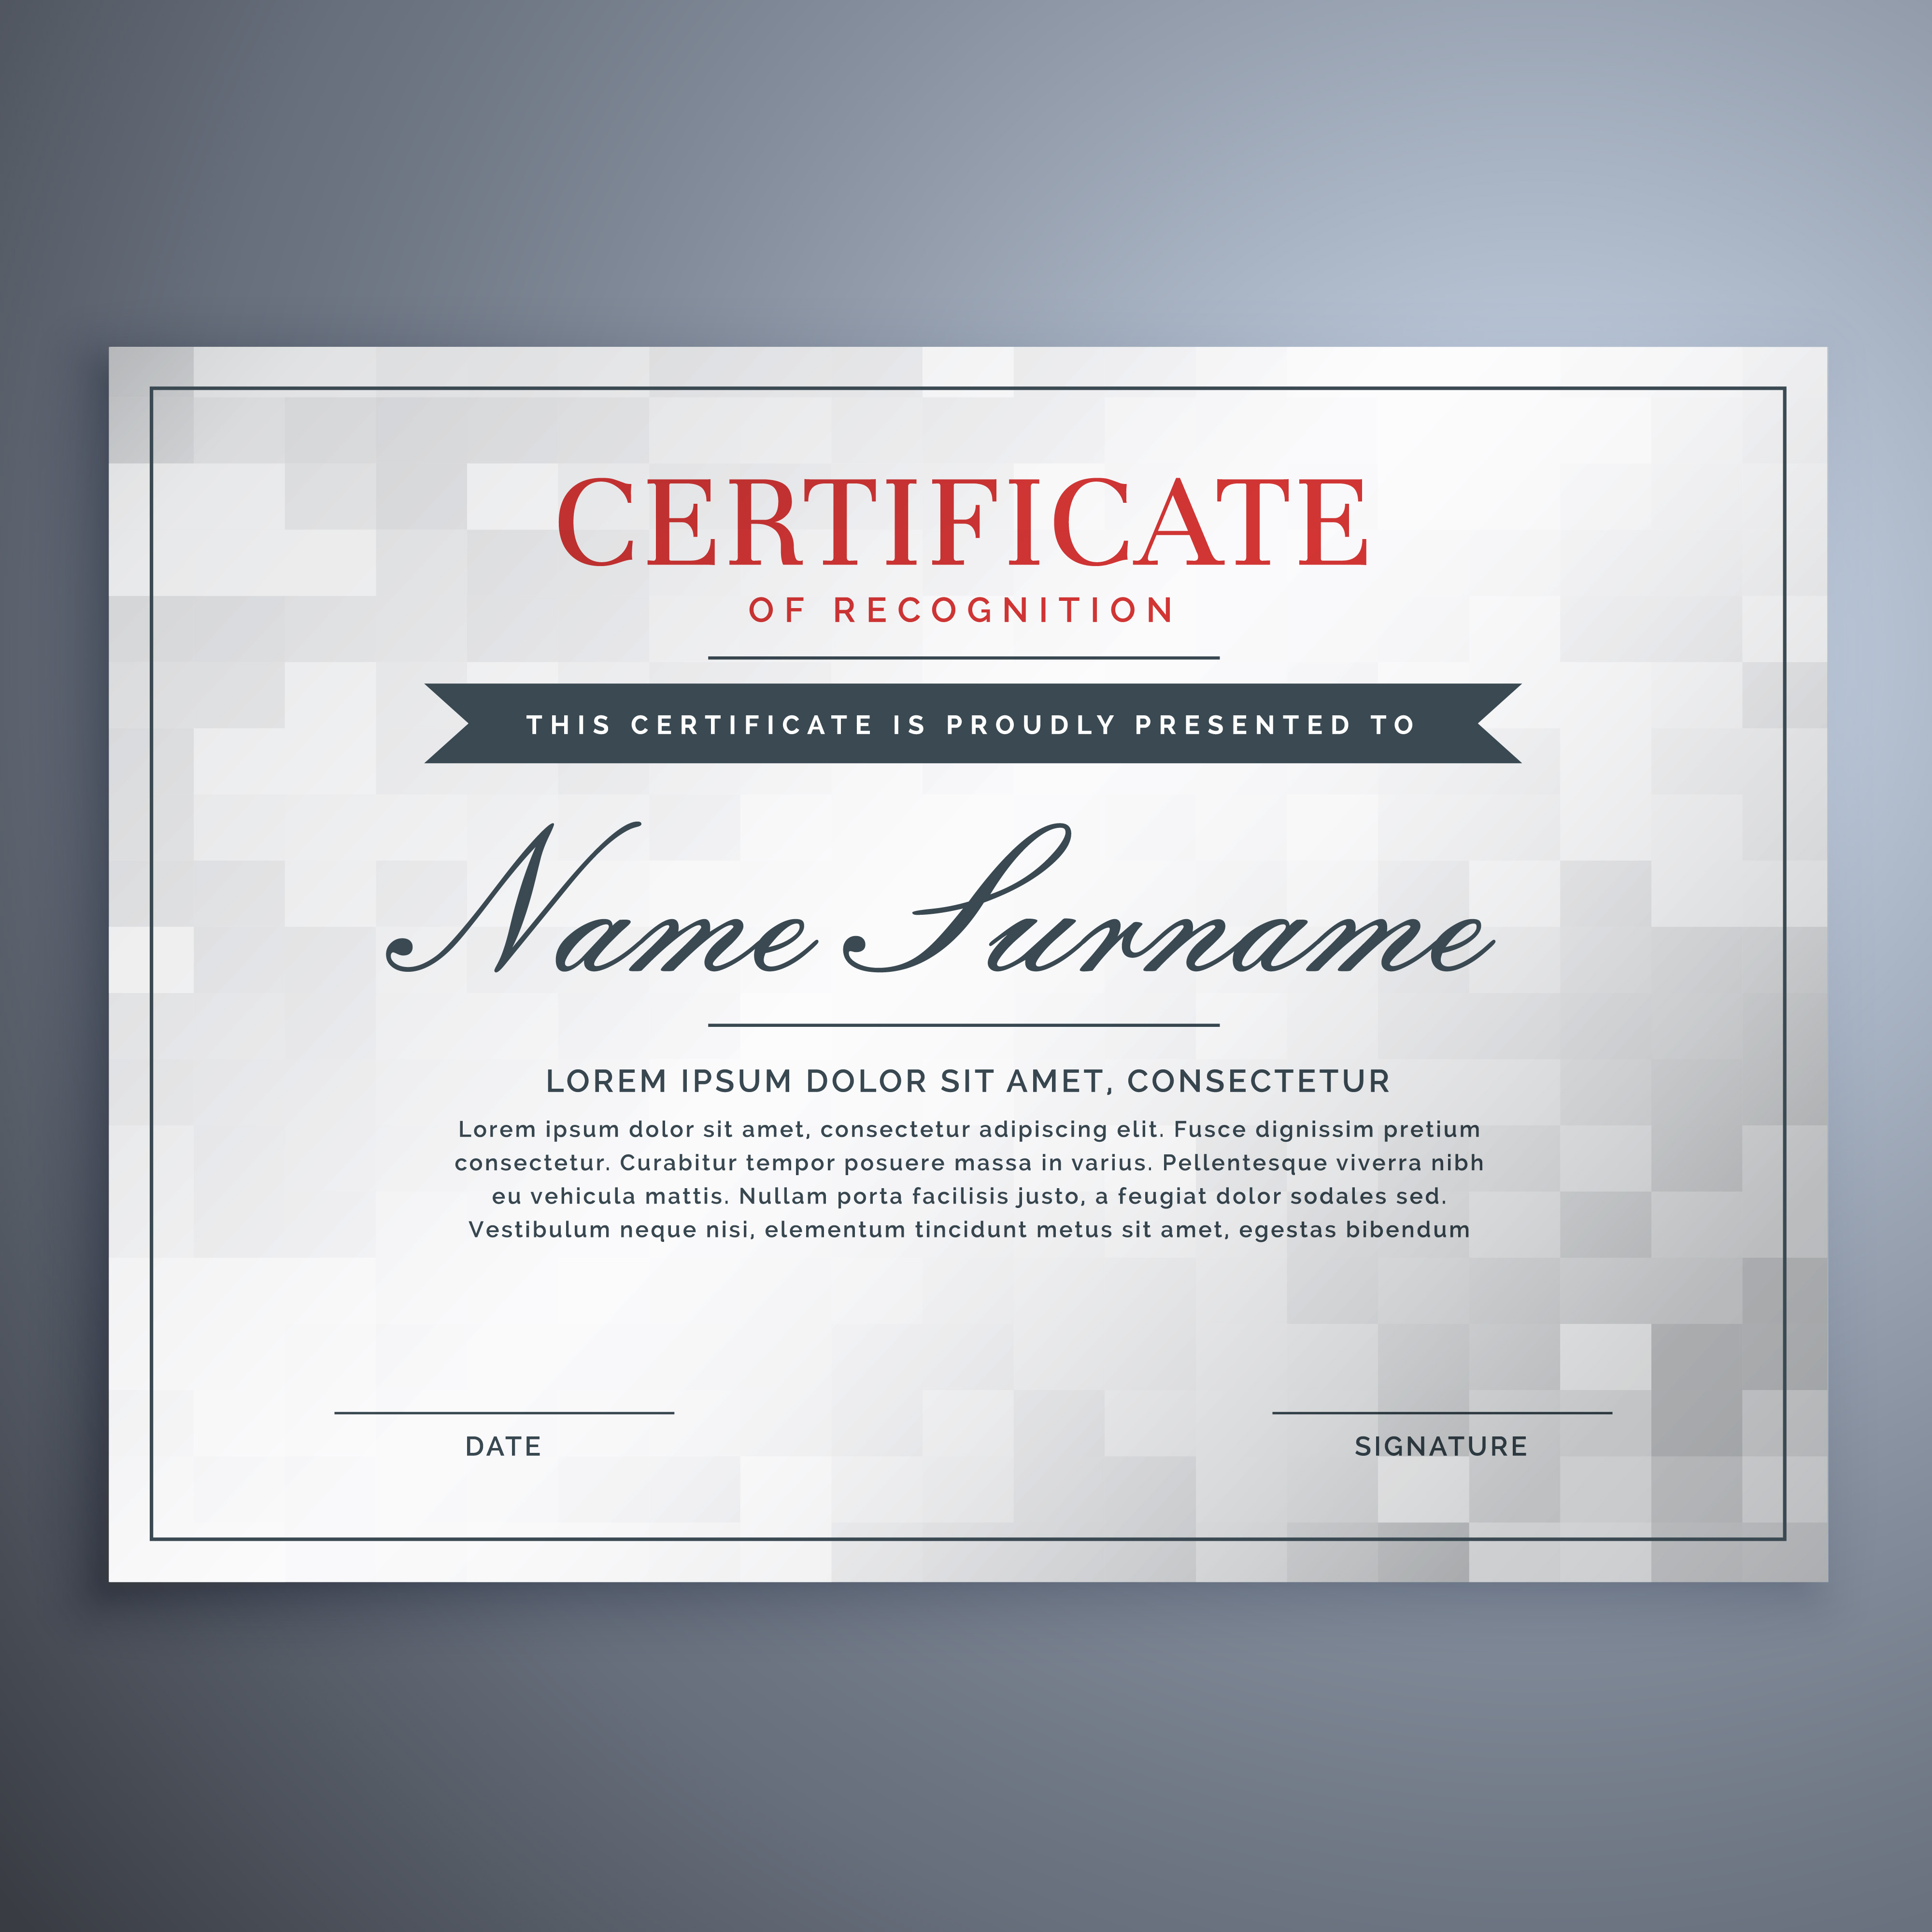 Elegant Certificate Design With White And Gray Checker Box